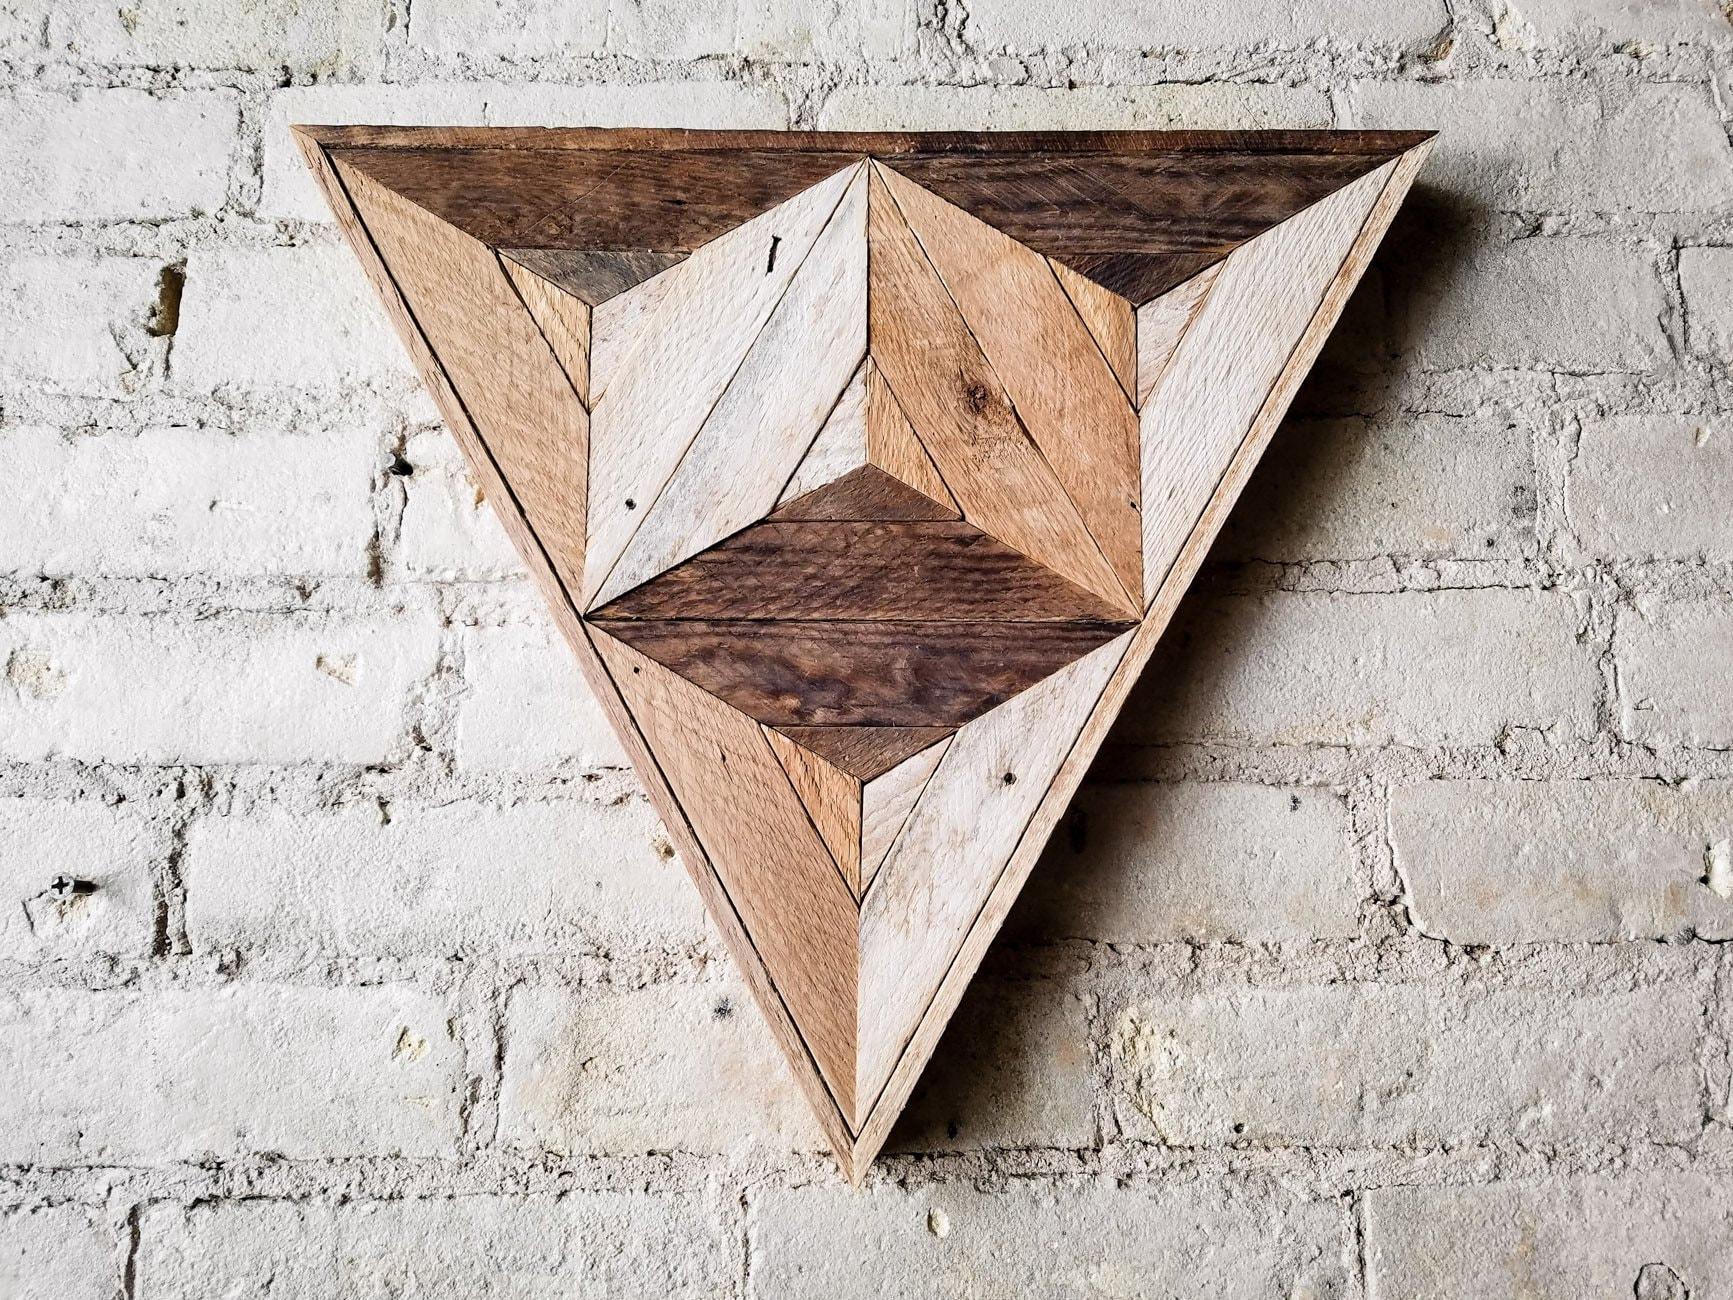 Reclaimed Wood Wall Art Wood Decor Reclaimed Wood Wood Art Rustic Geometric Wood Decor Handmade Triangle Cube Modern Art